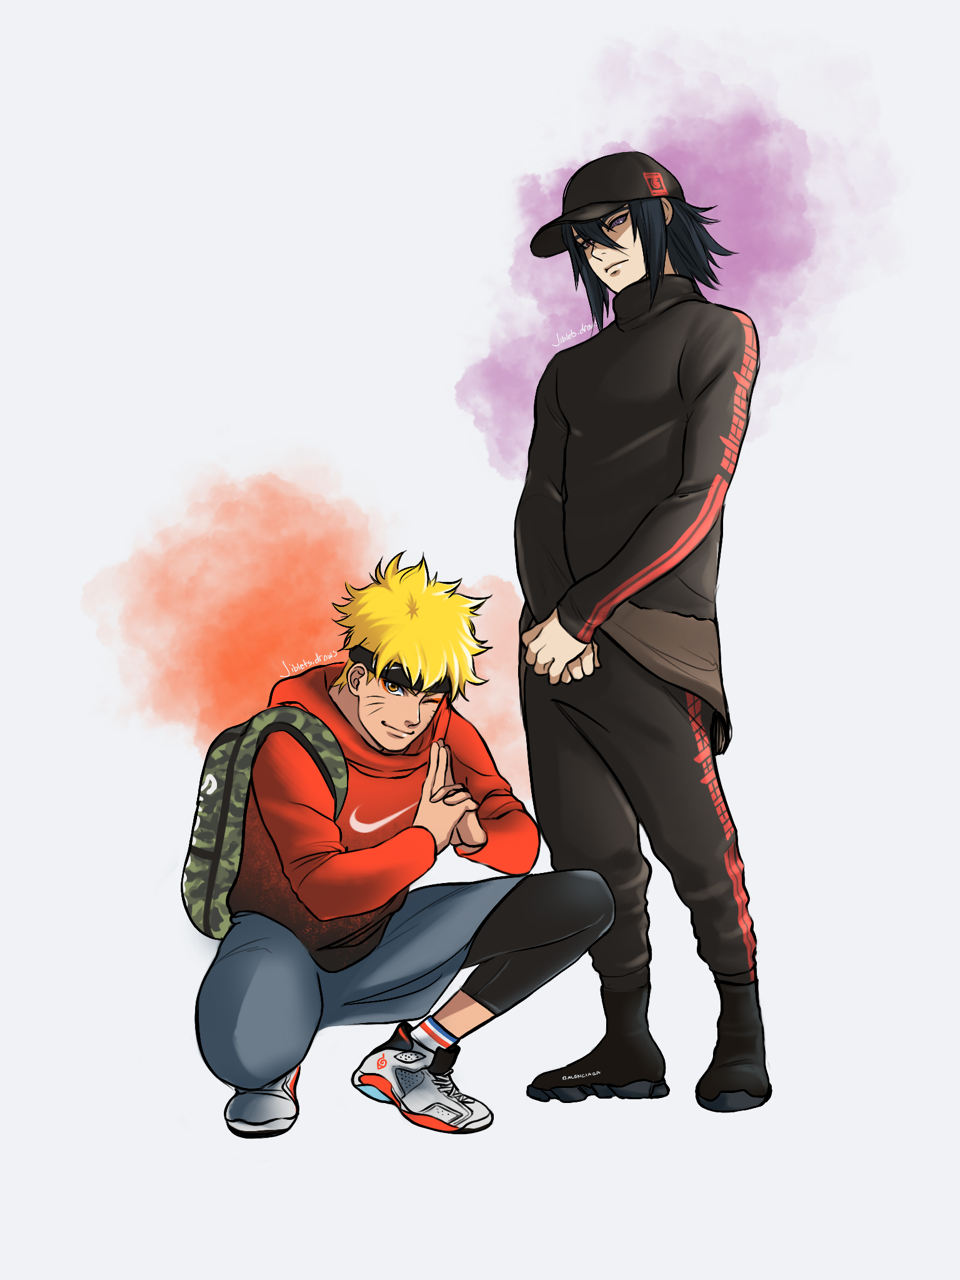 Naruto Adidas Wallpapers   Top Naruto Adidas Backgrounds 960x1280